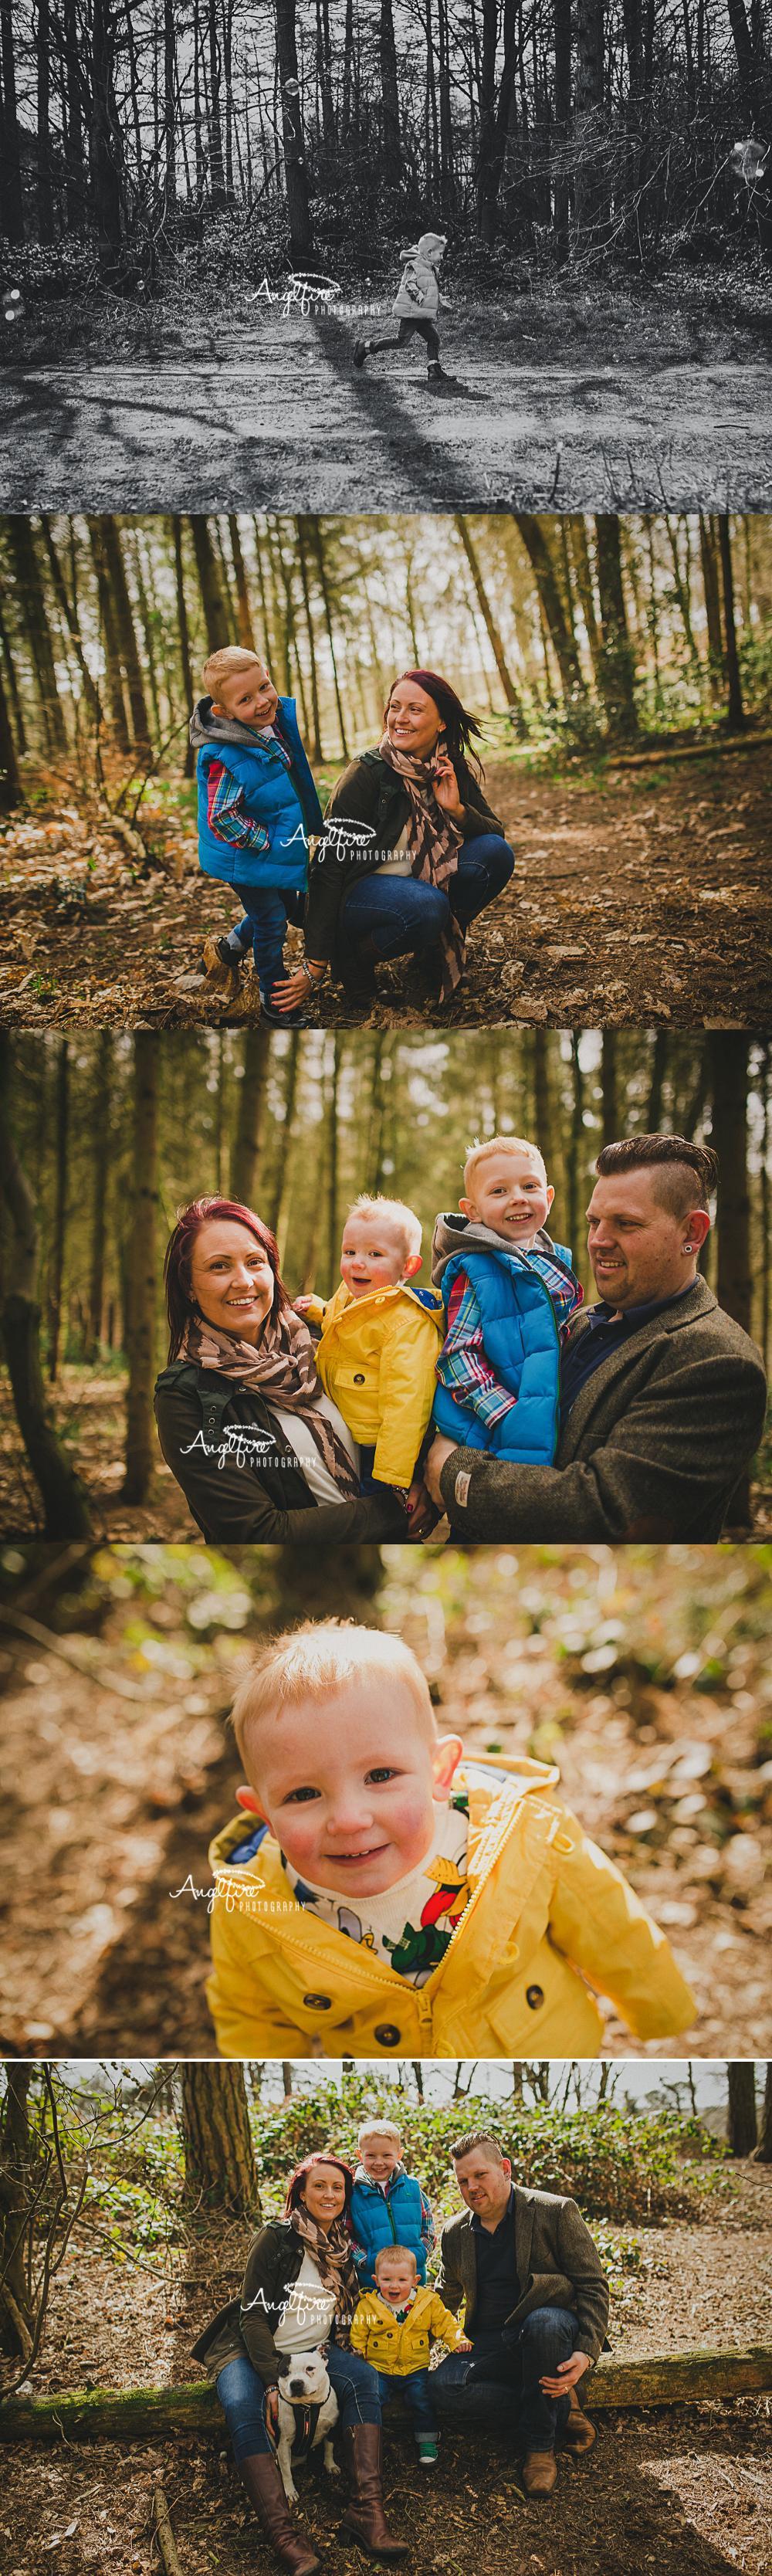 West Midlands Childrens Photographer | Angelfire Photography | www.angelfirephotography.co.uk 2